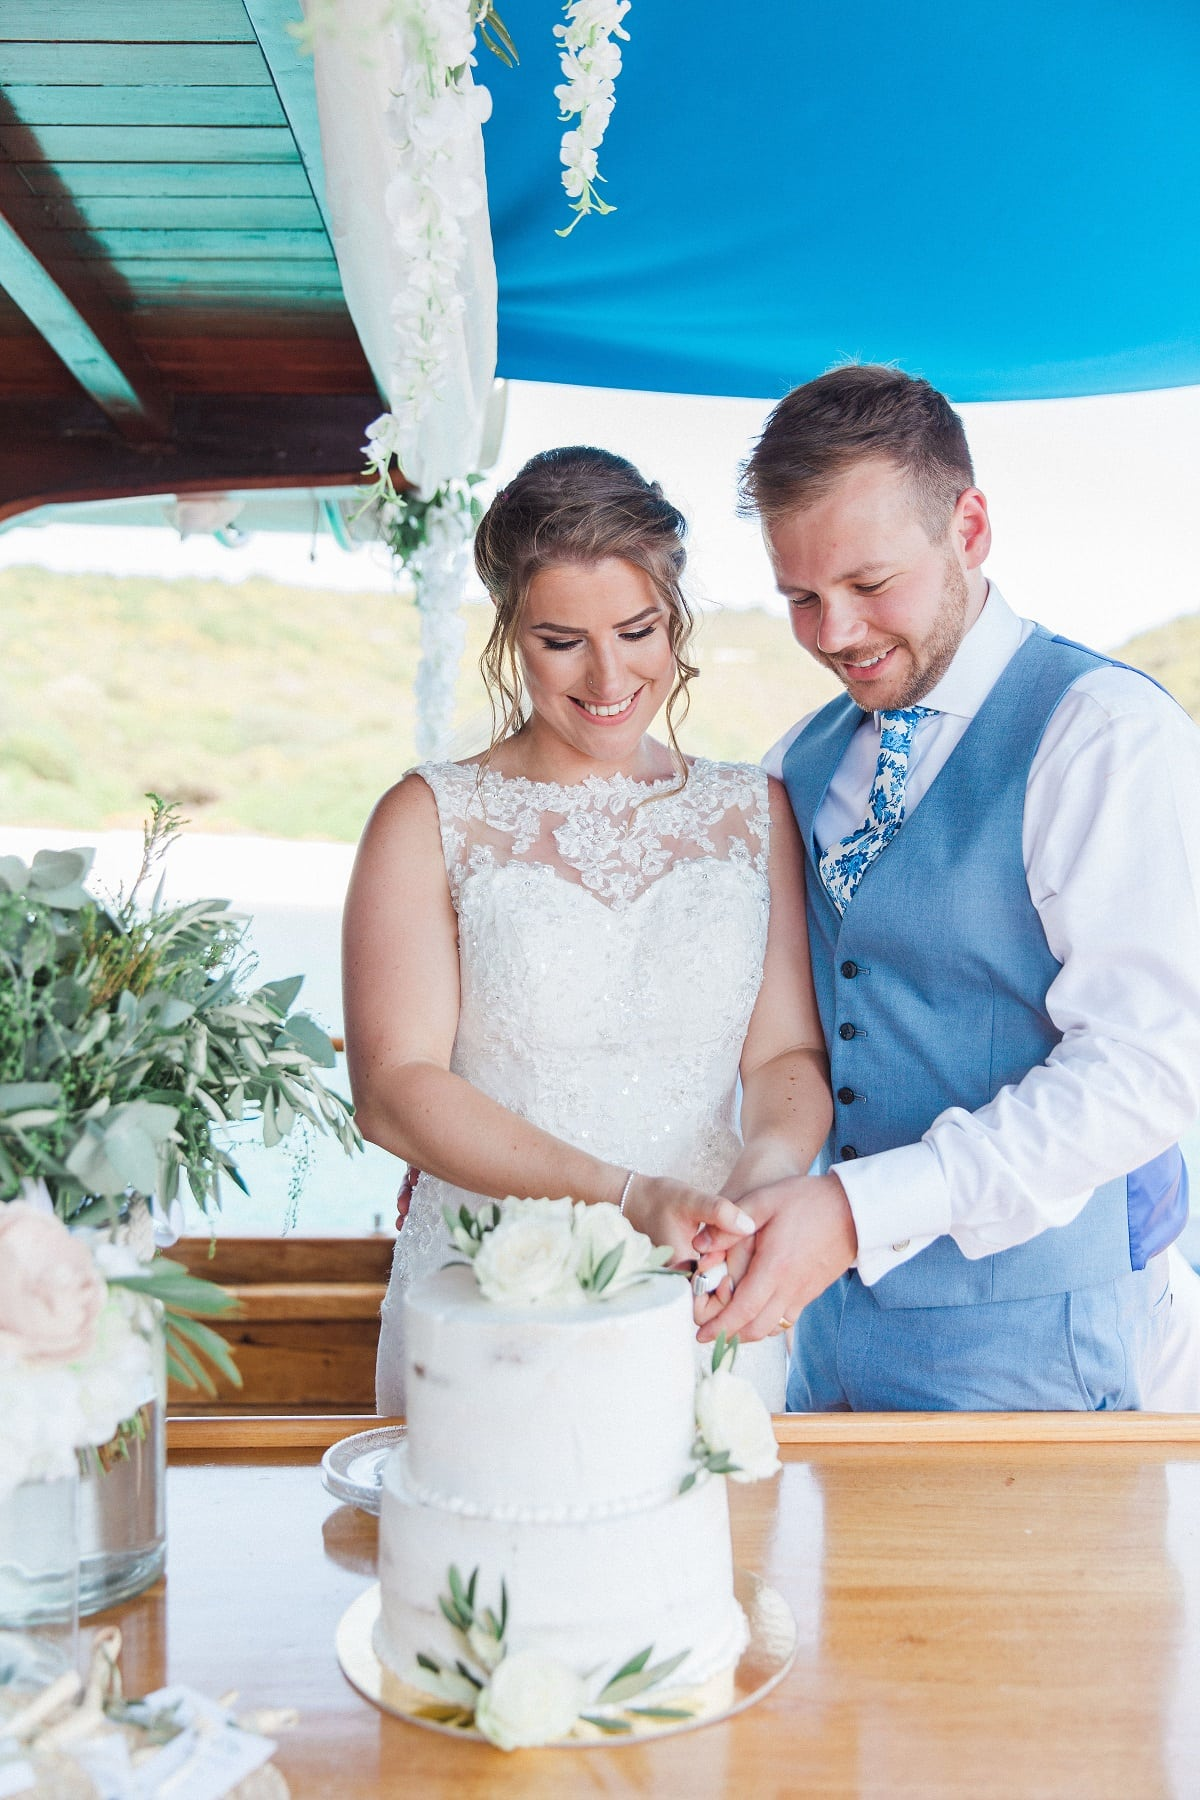 Boat Drinks Reception - Greek Wedding Abroad   Planned by Lefkas Weddings   Maxeen Kim Photography